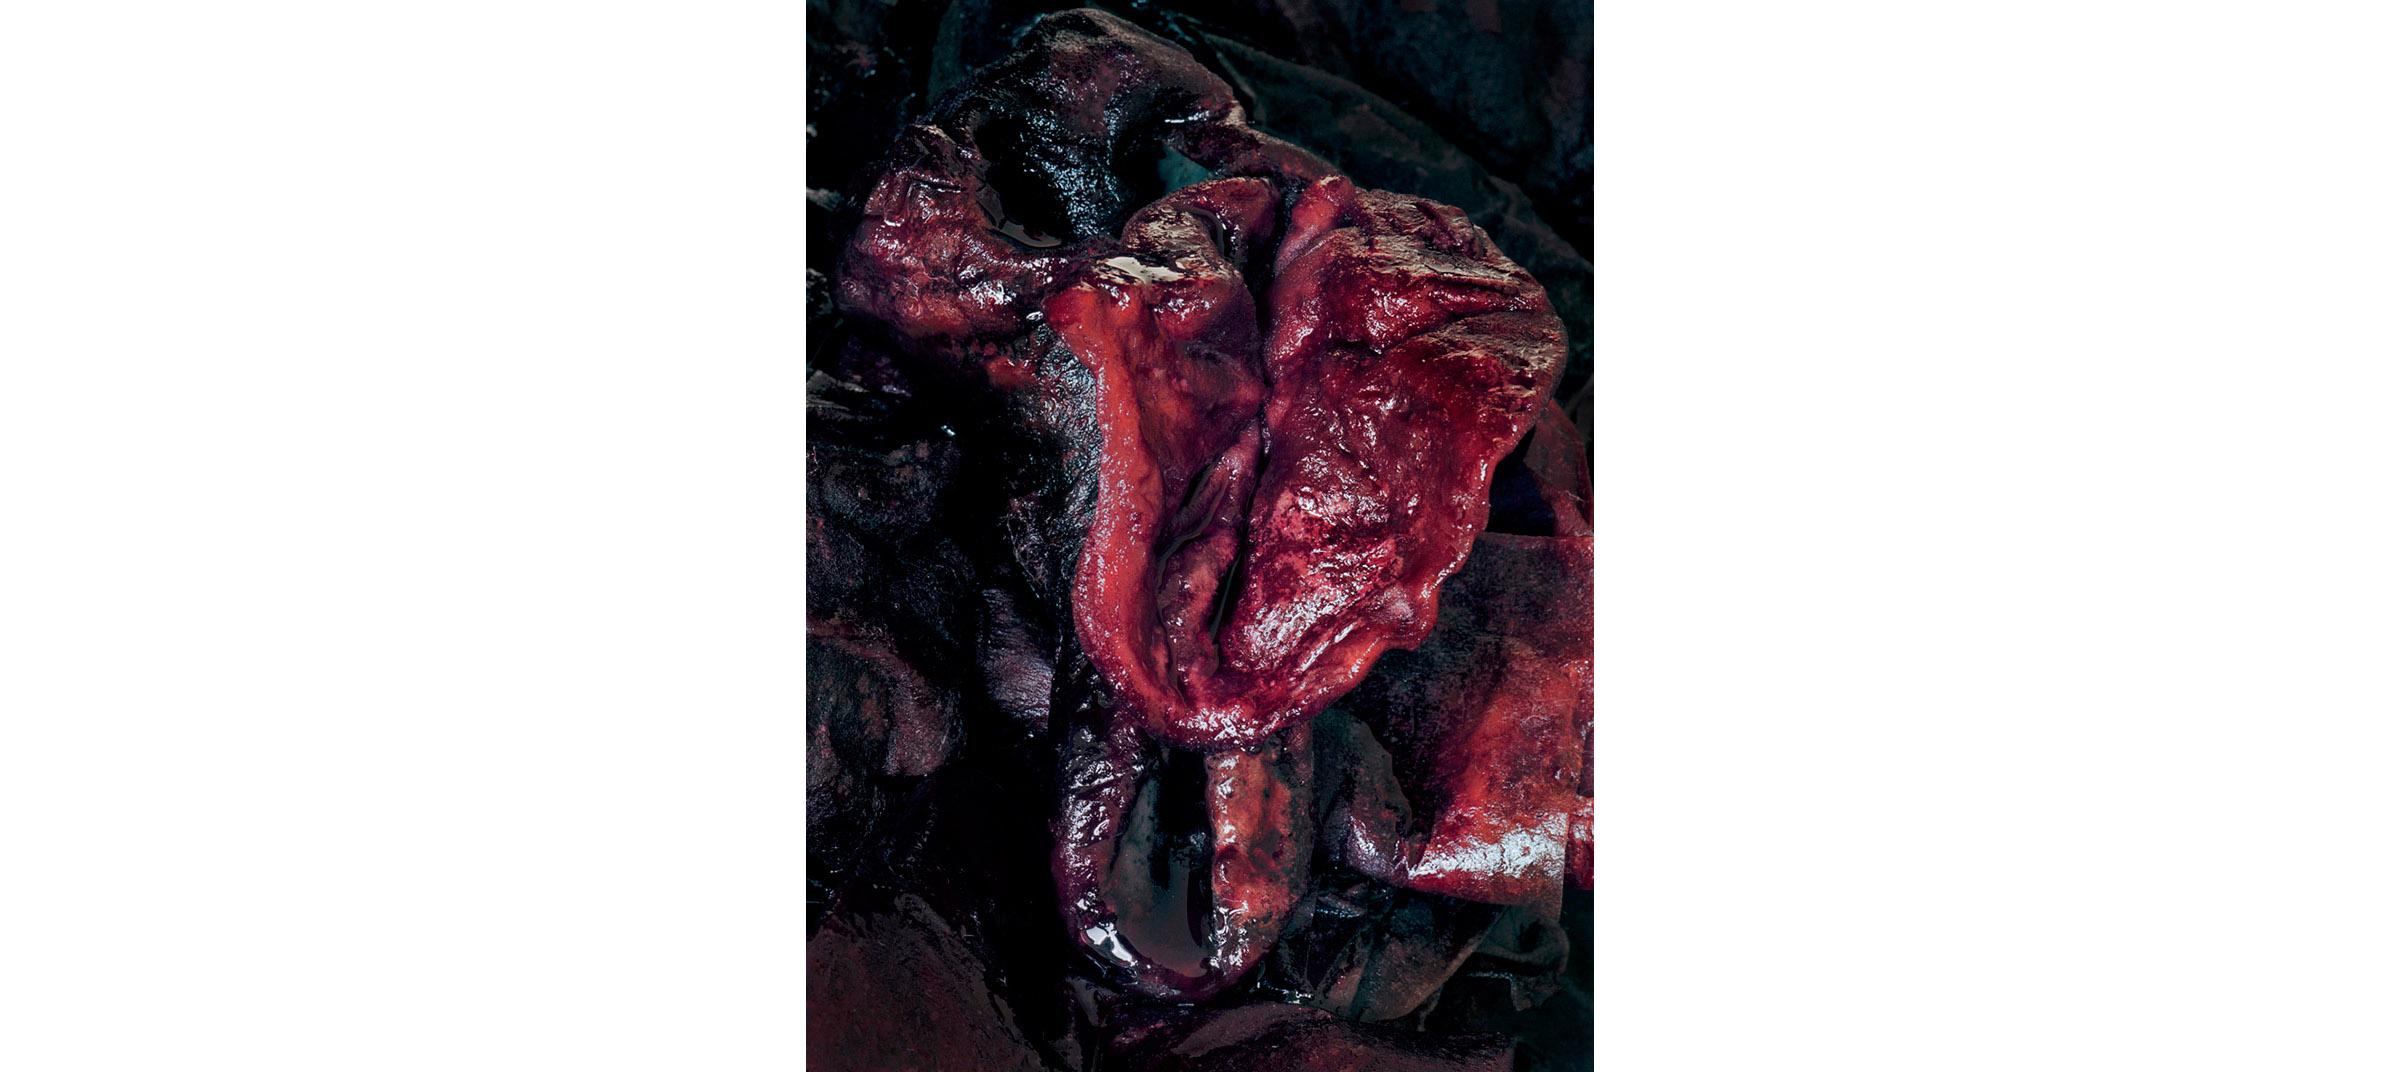 Red Fluids  Untitled N°5, 2005/2008 Tirage gélatino argentique 144 x 104 cm | Gelatin silver print 56,69 x 40,94 inches  2/5